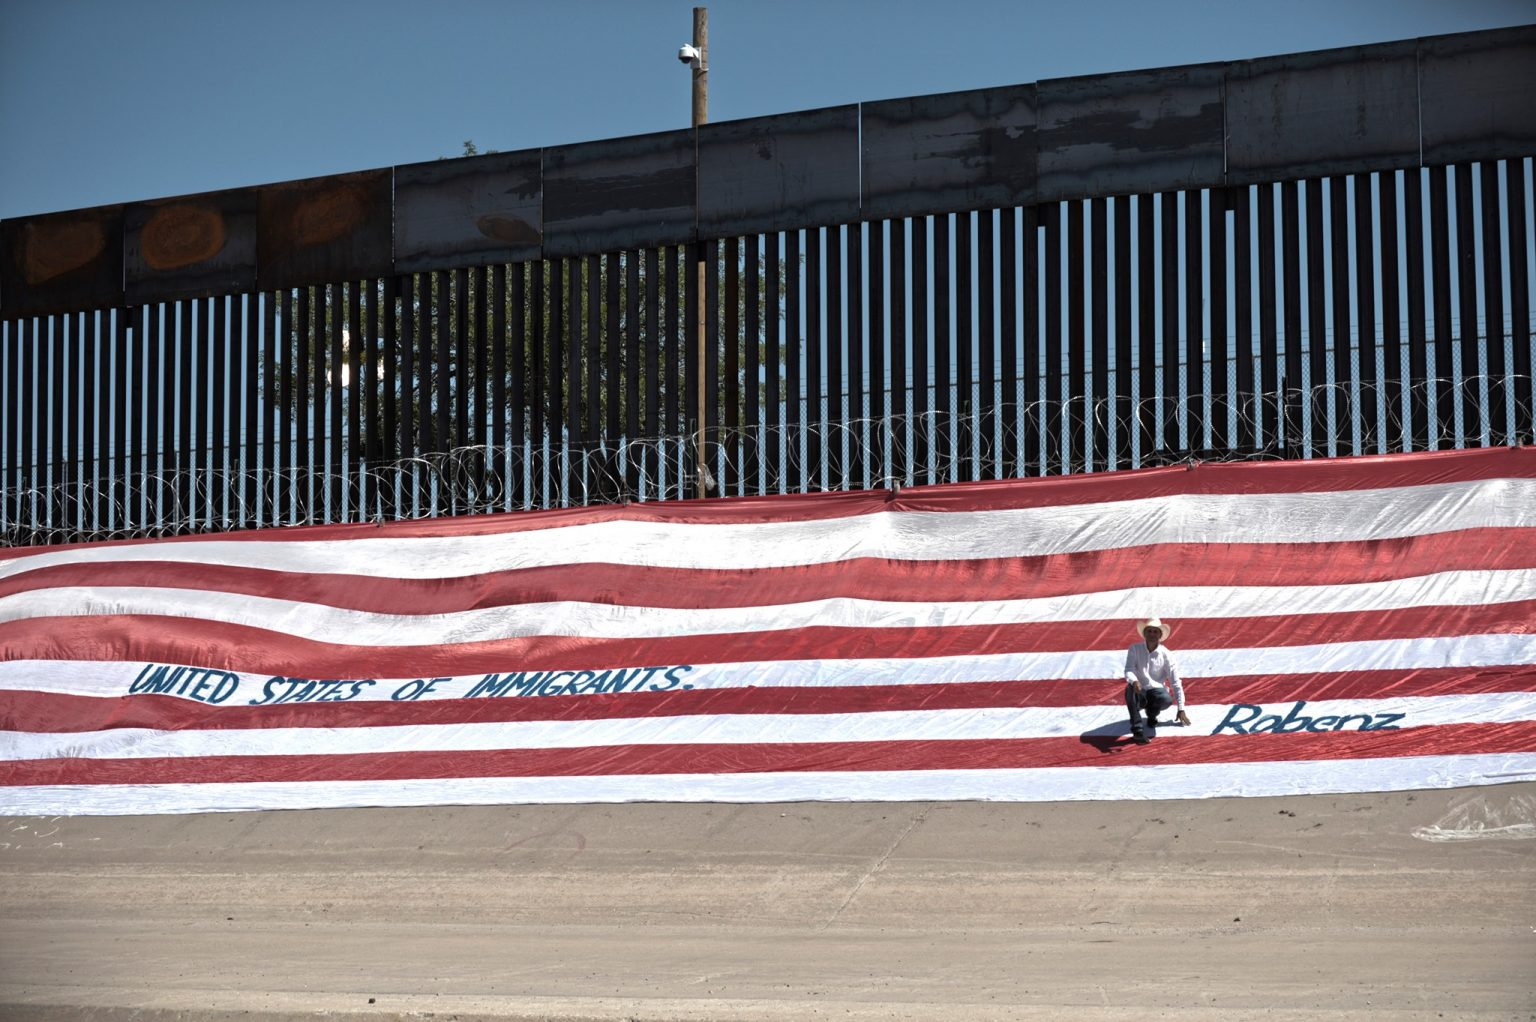 Alarga Estados Unidos la espera de asilo a migrantes enviados a México